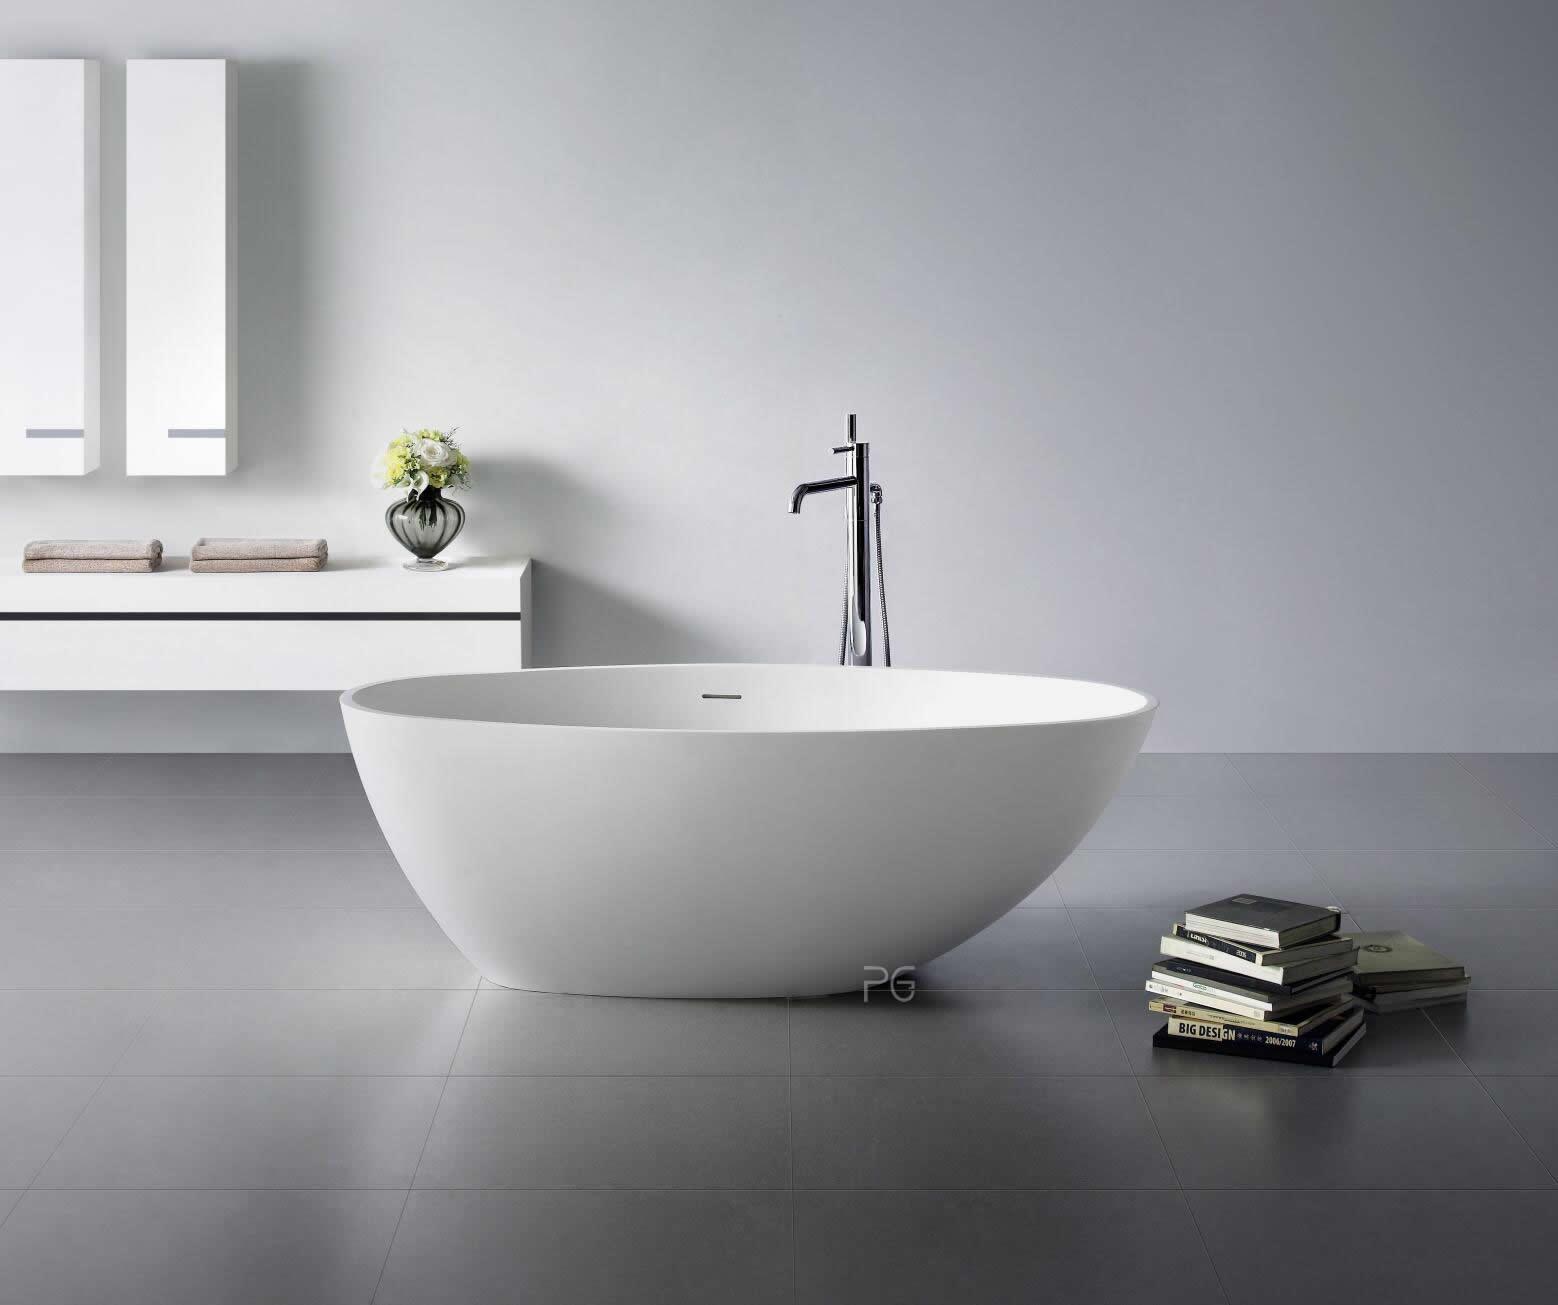 Oval Bathtub|Bathtub|Vanity Basin|Bathtub faucet|PG CASTSTONE